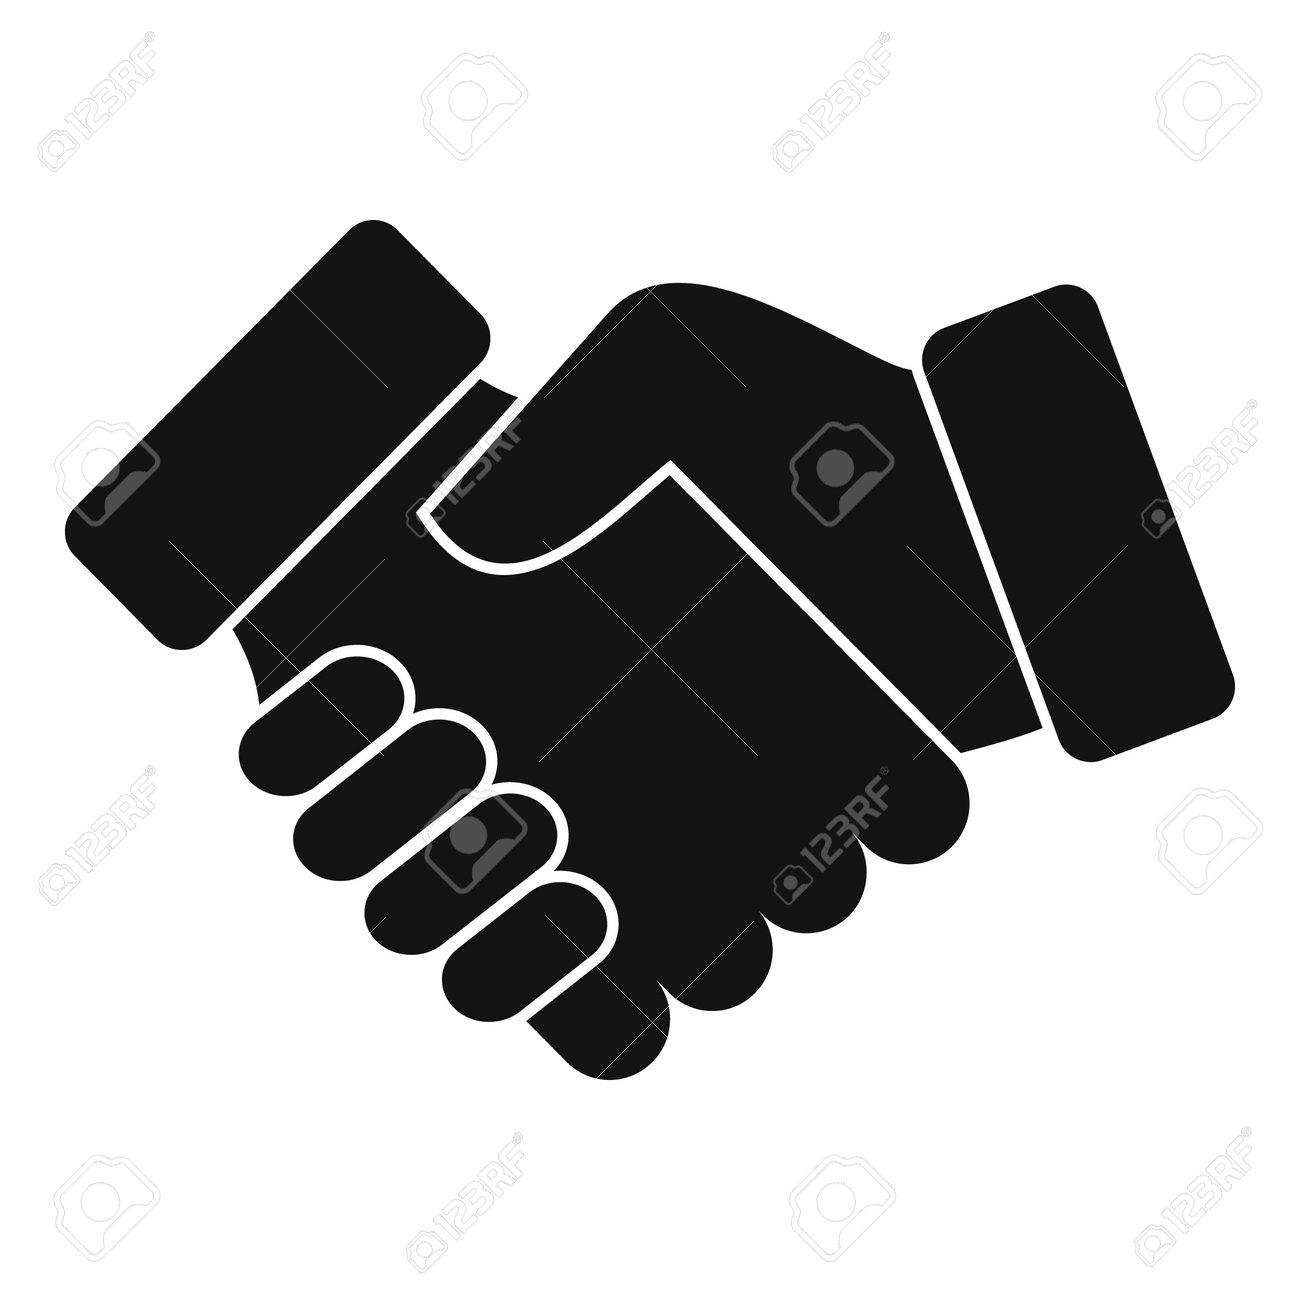 Credit handshake icon, simple style - 166781411